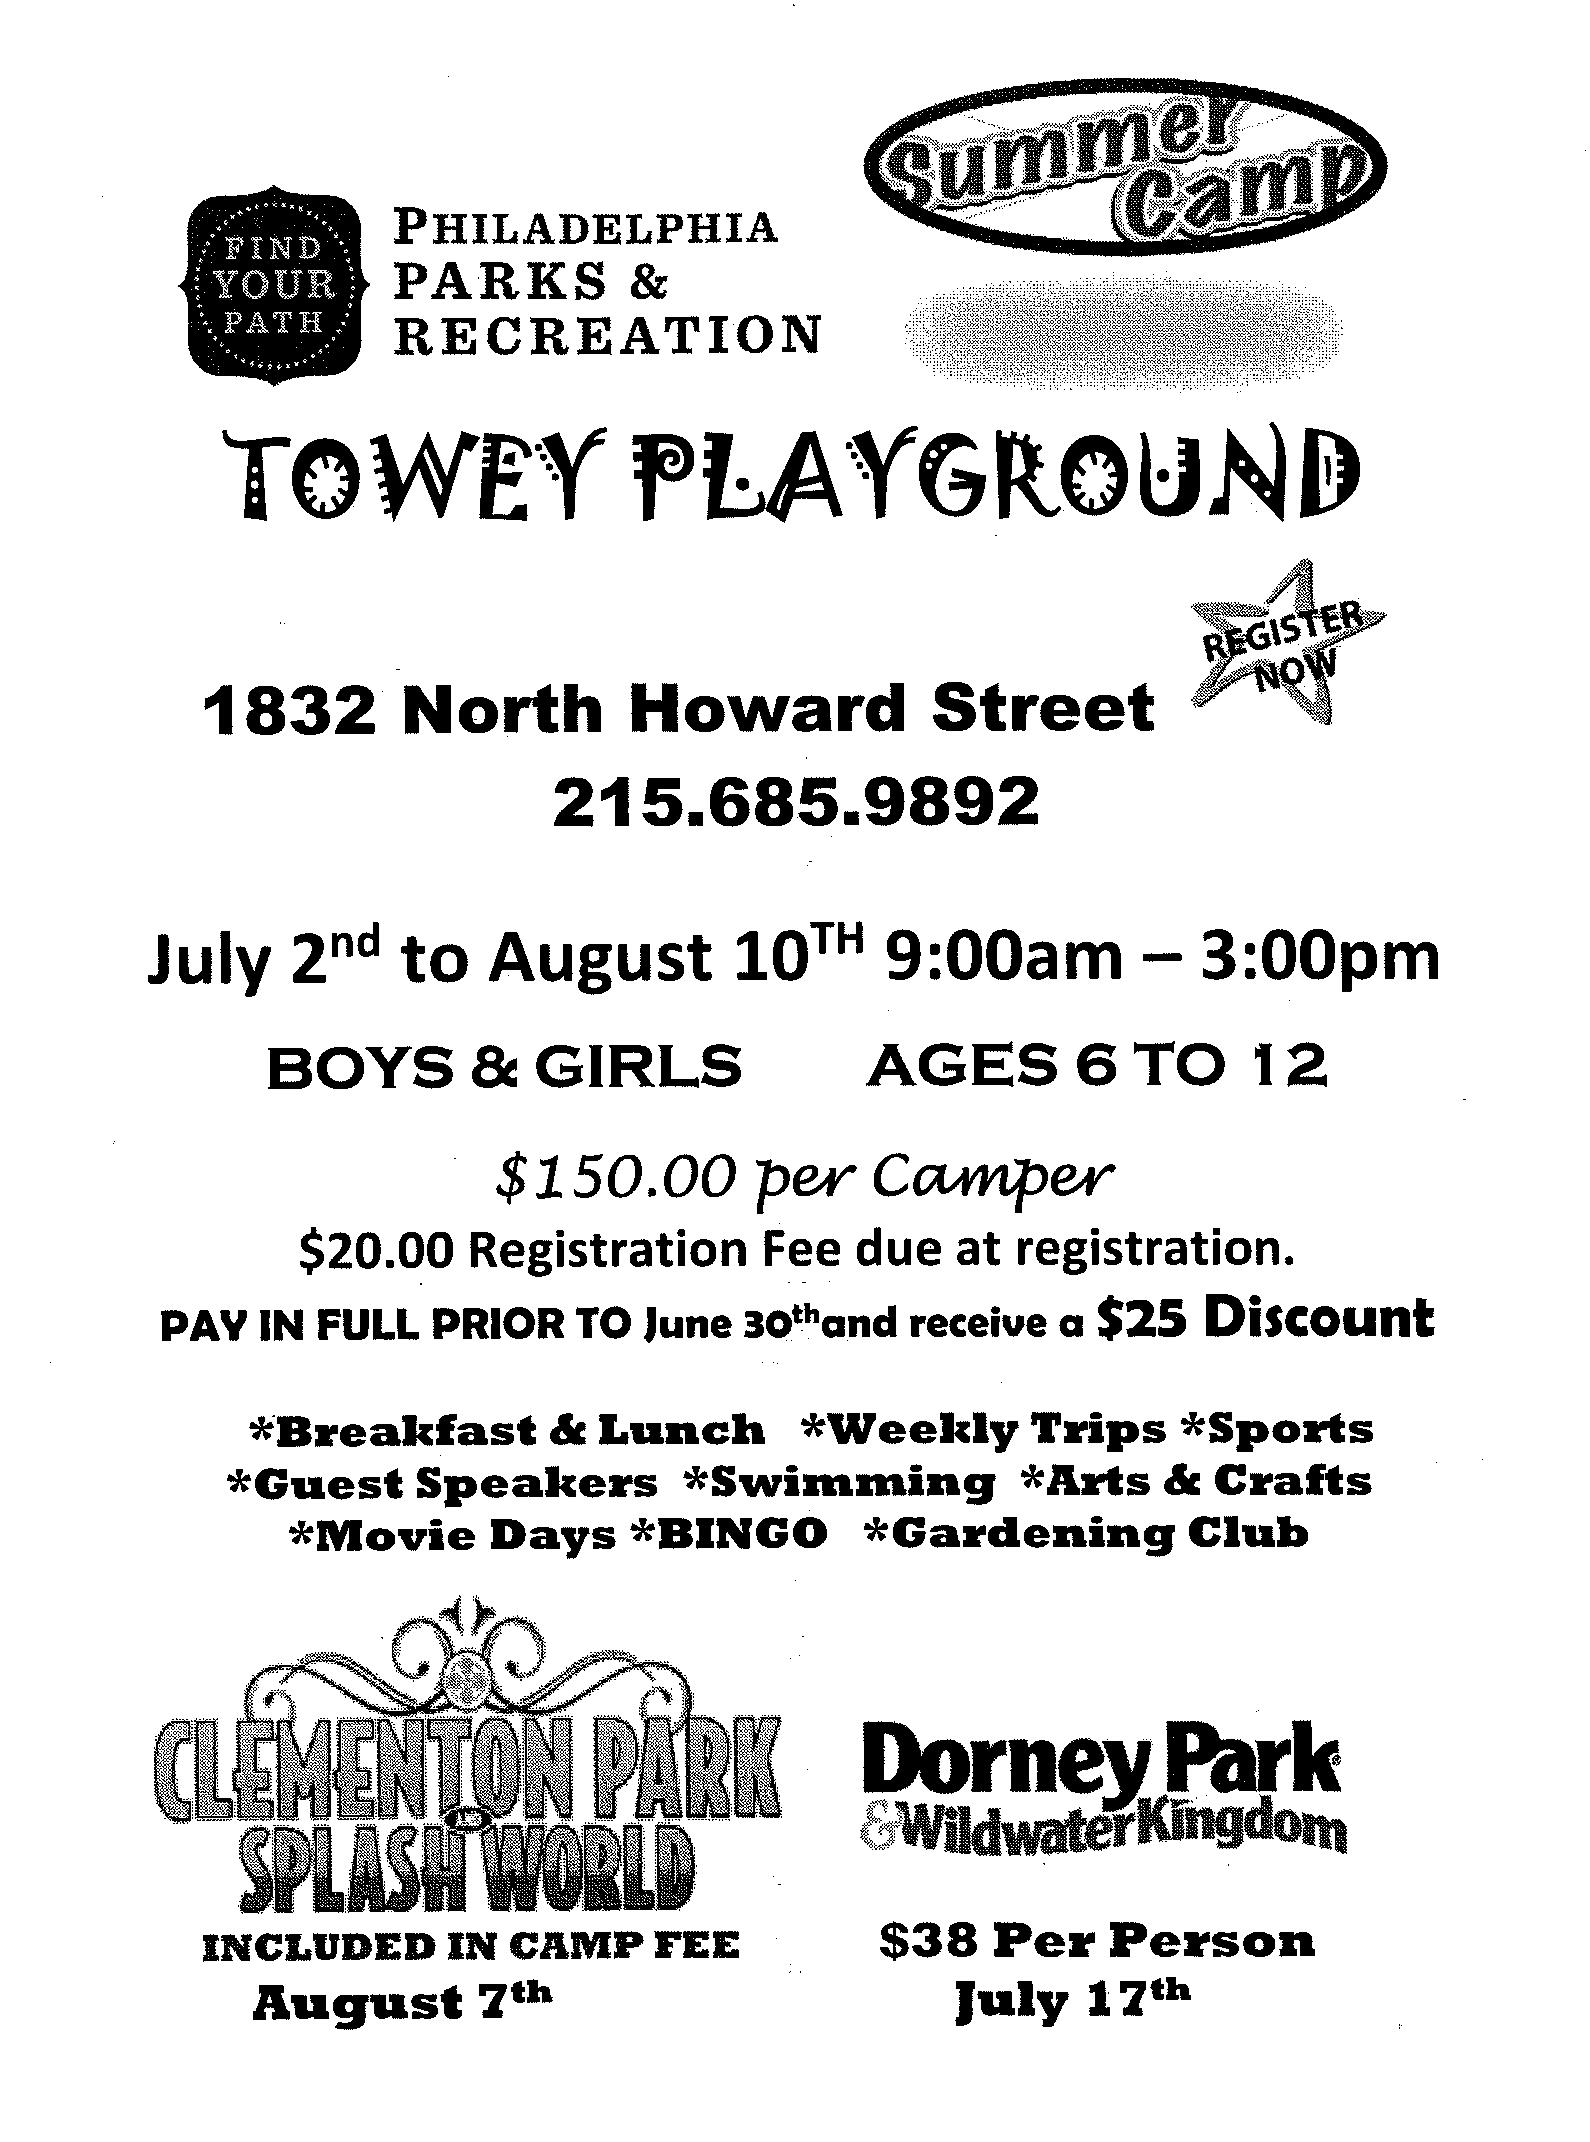 Towey playground-1.png